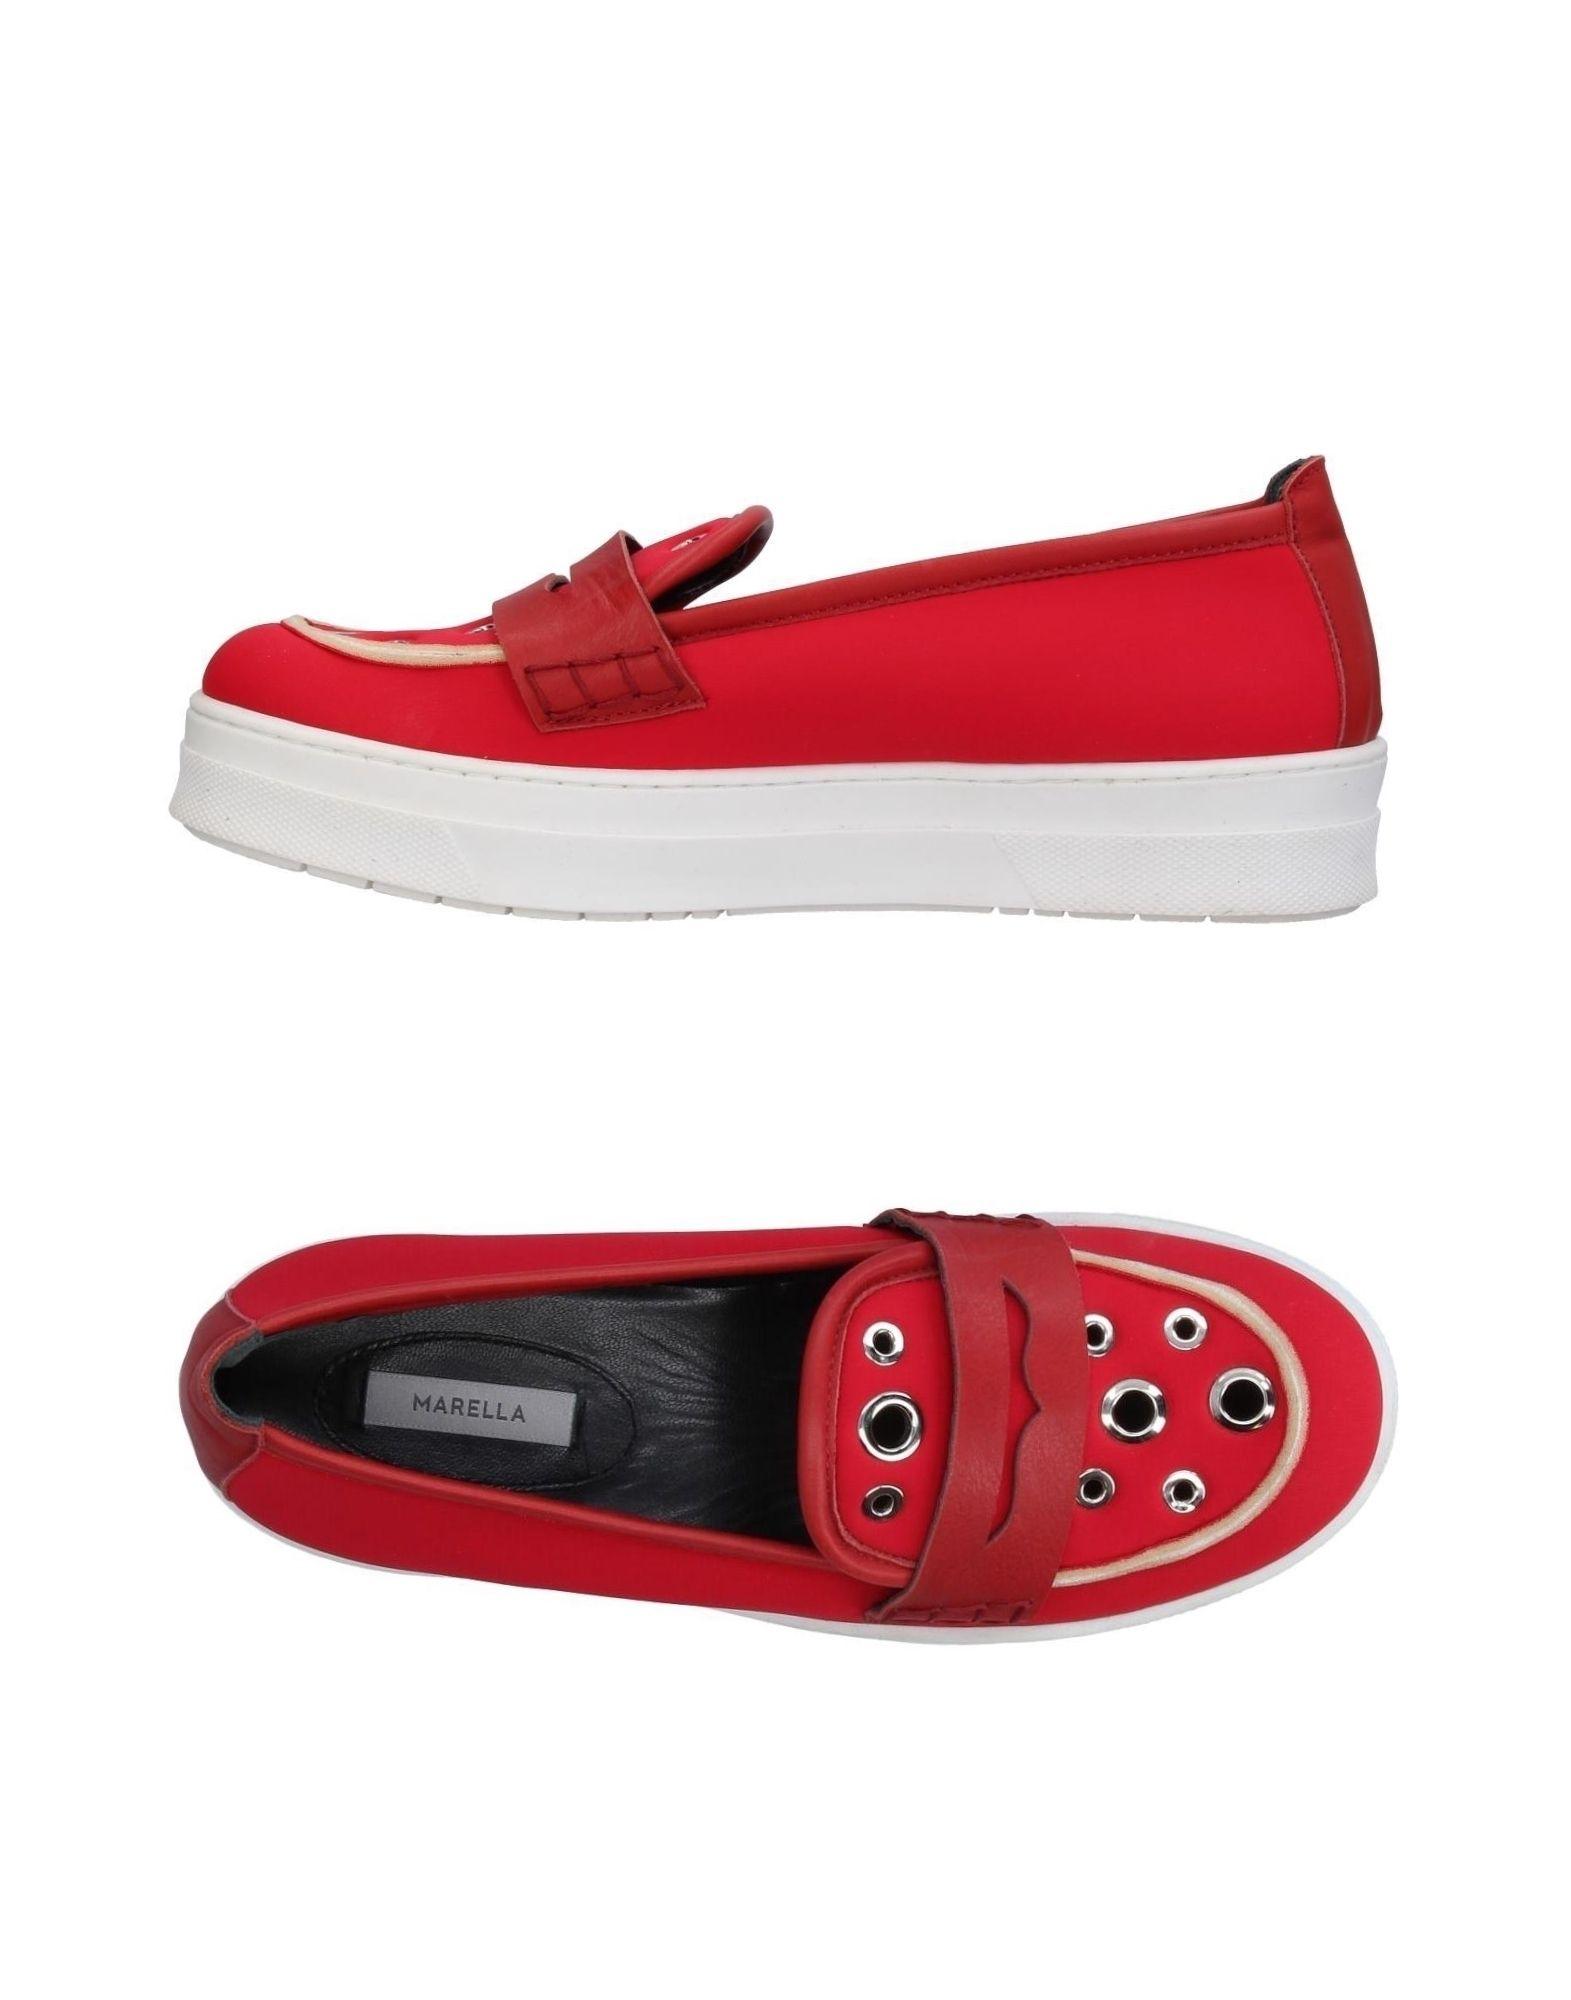 Marella Mokassins Damen  11372684XS Gute Qualität beliebte Schuhe